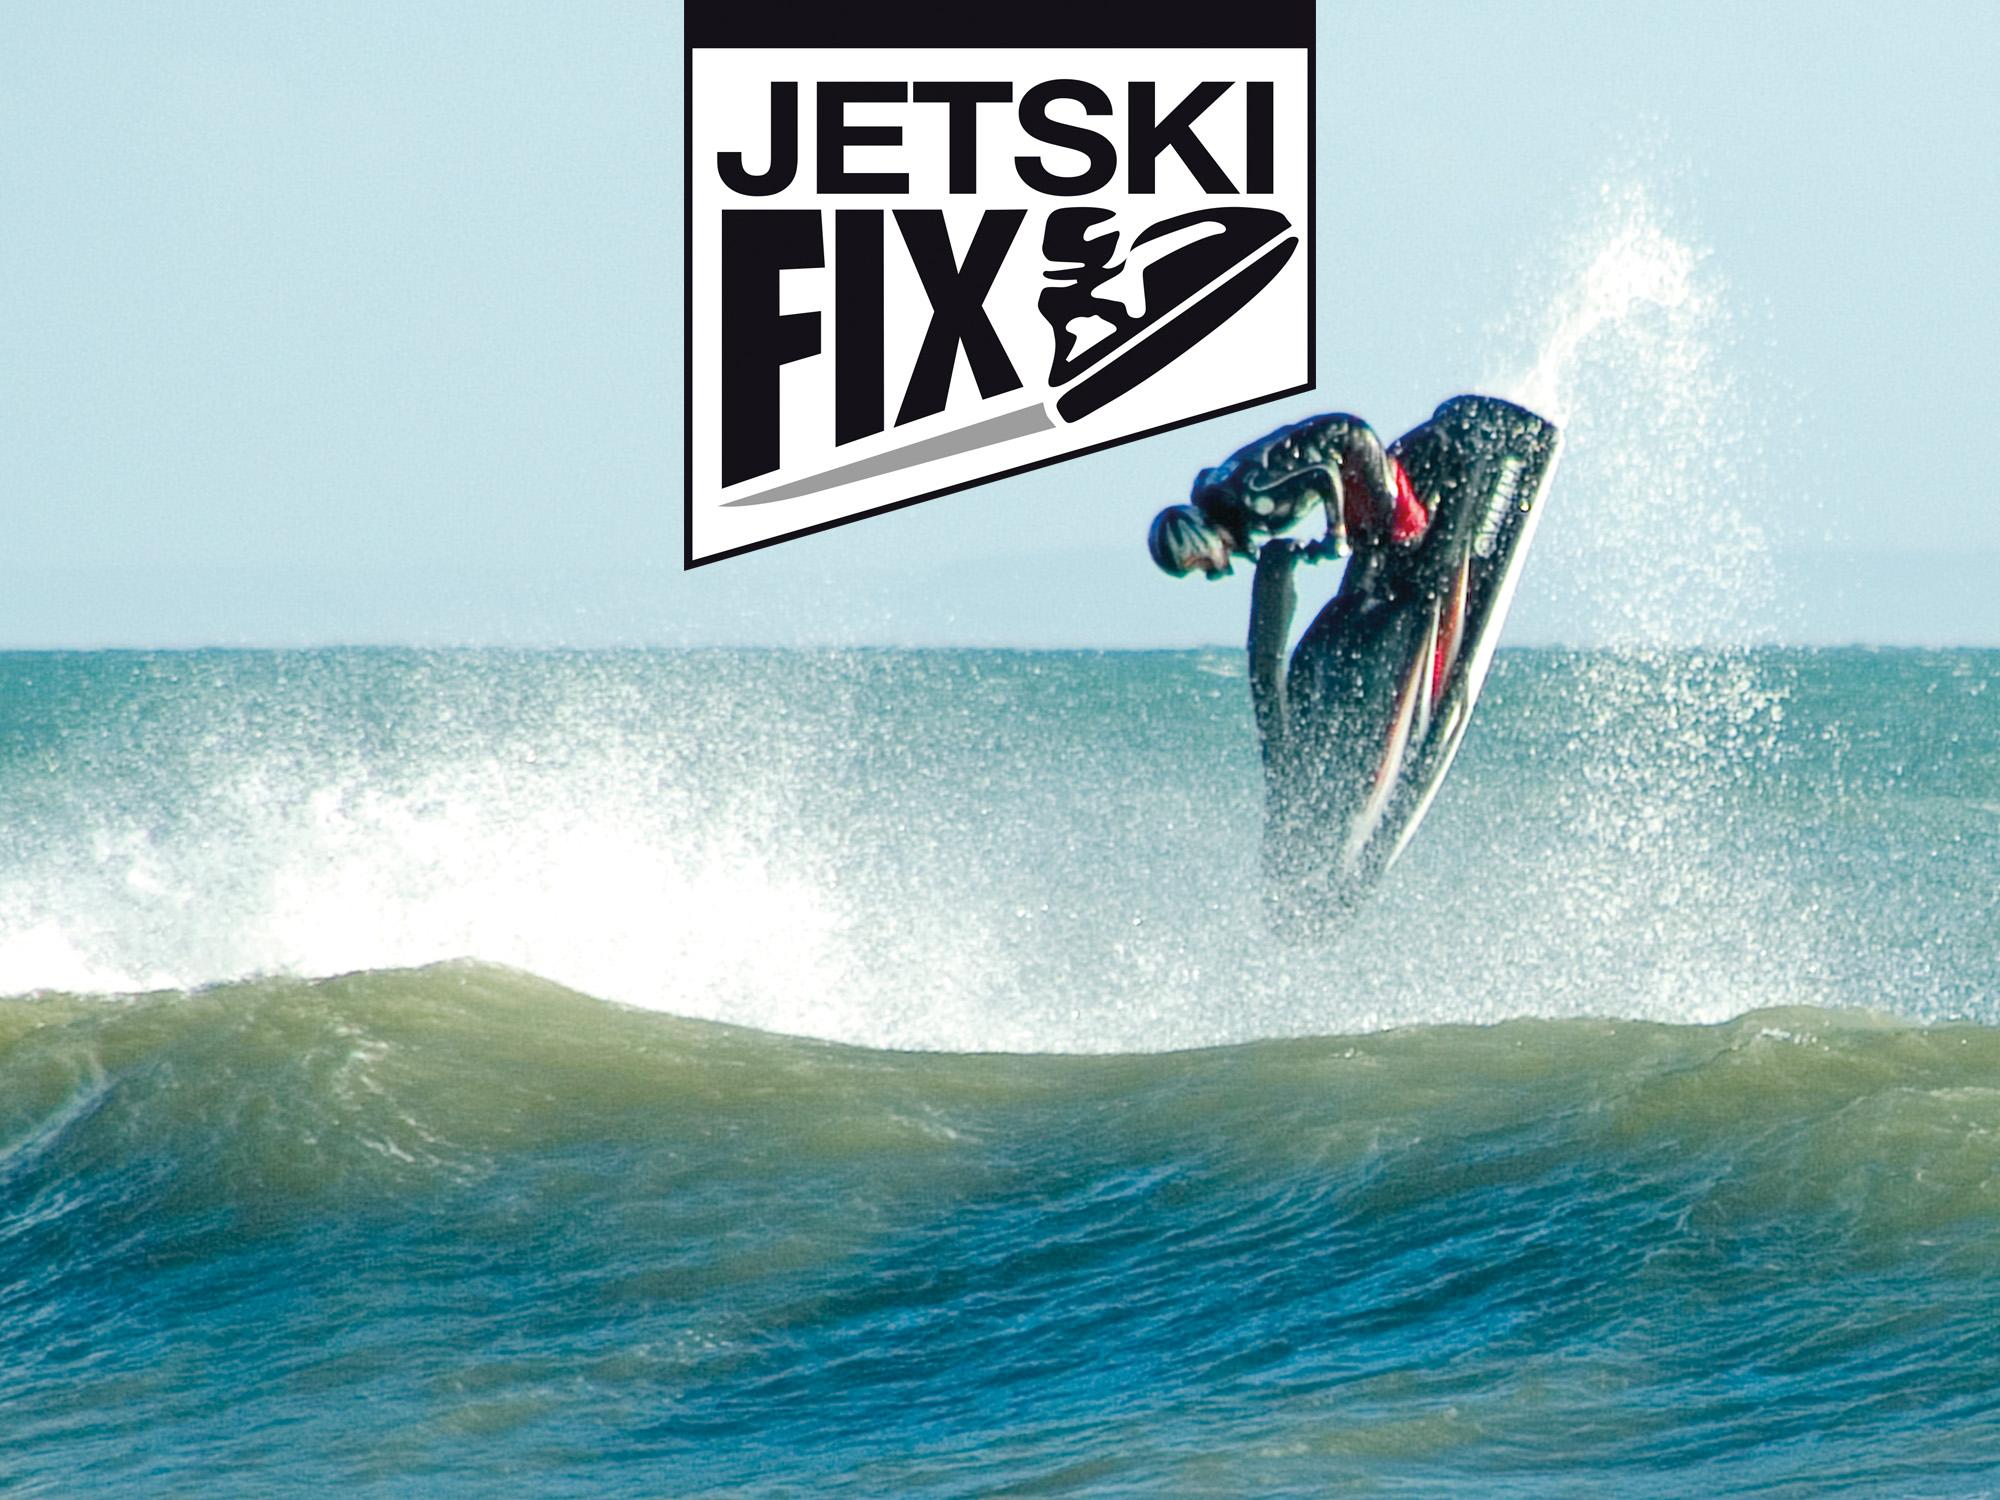 jetskifix nose dive